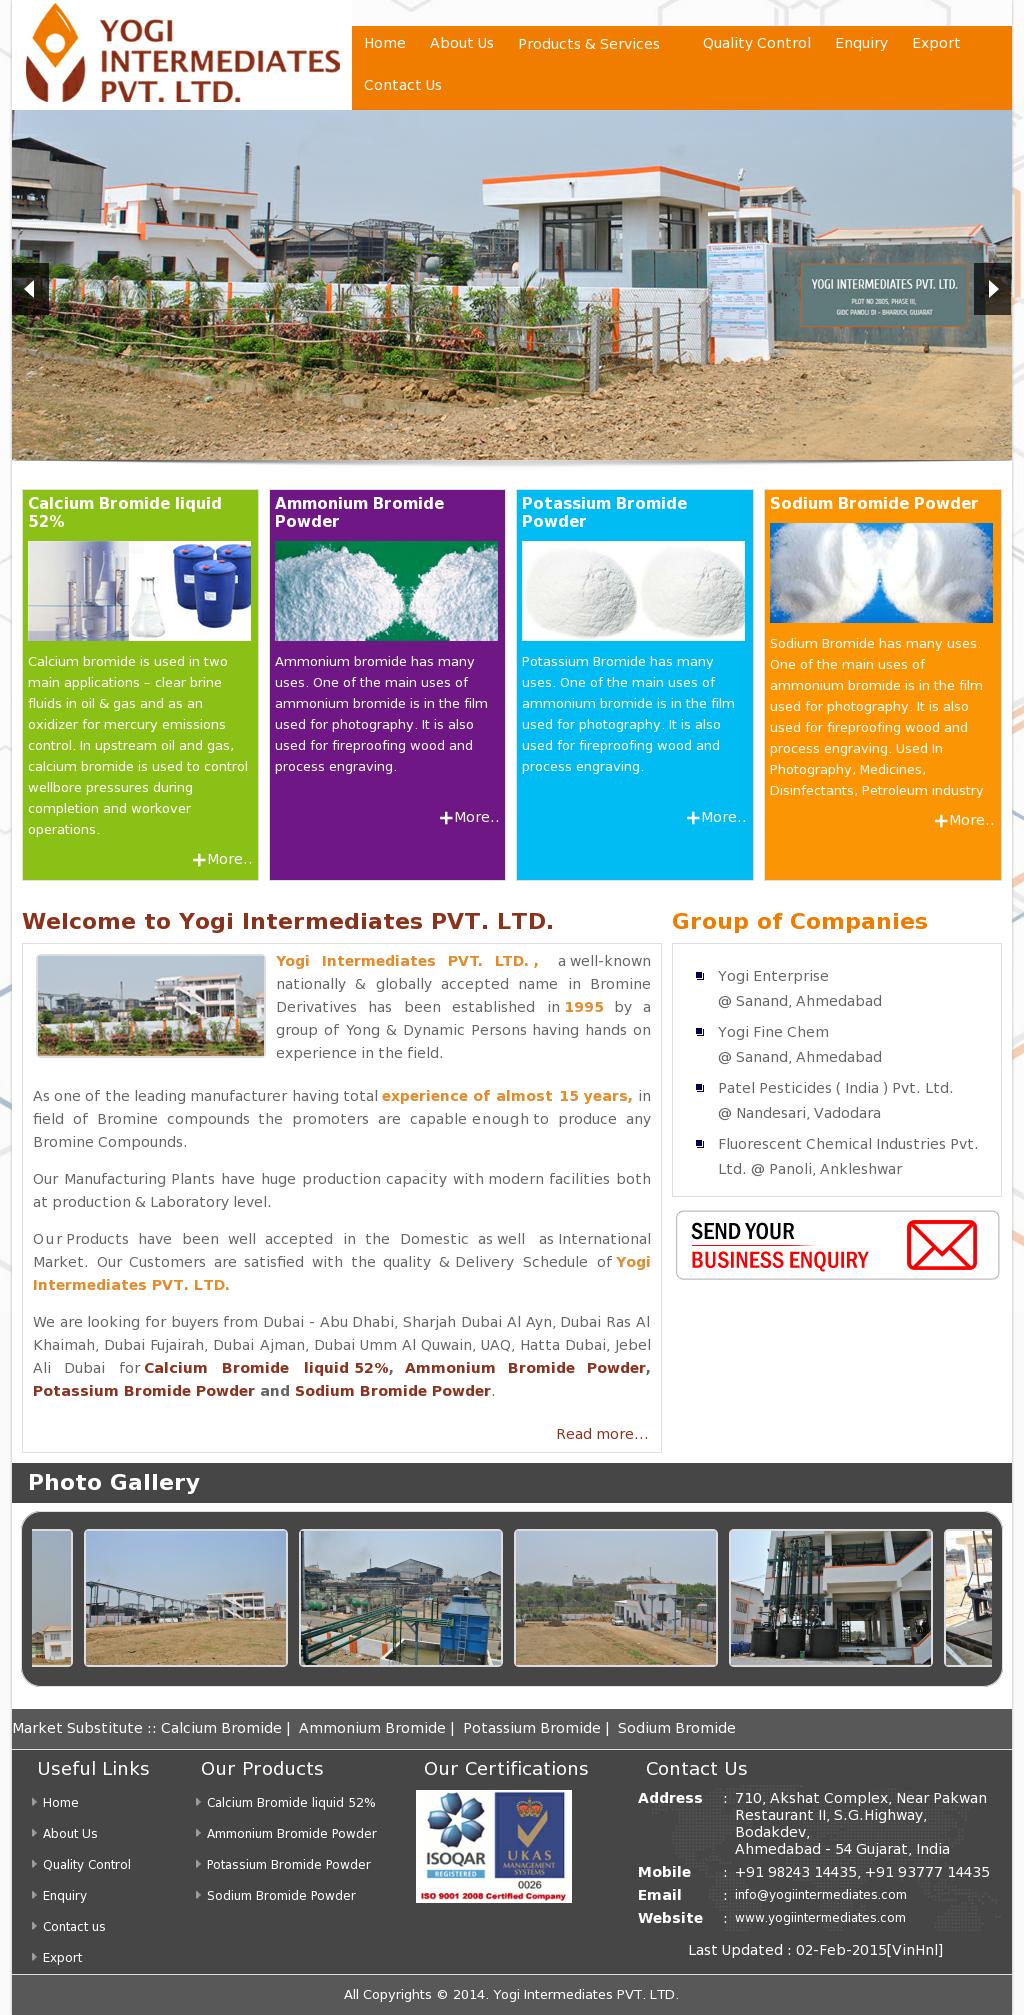 Yogi Intermediates Competitors, Revenue and Employees